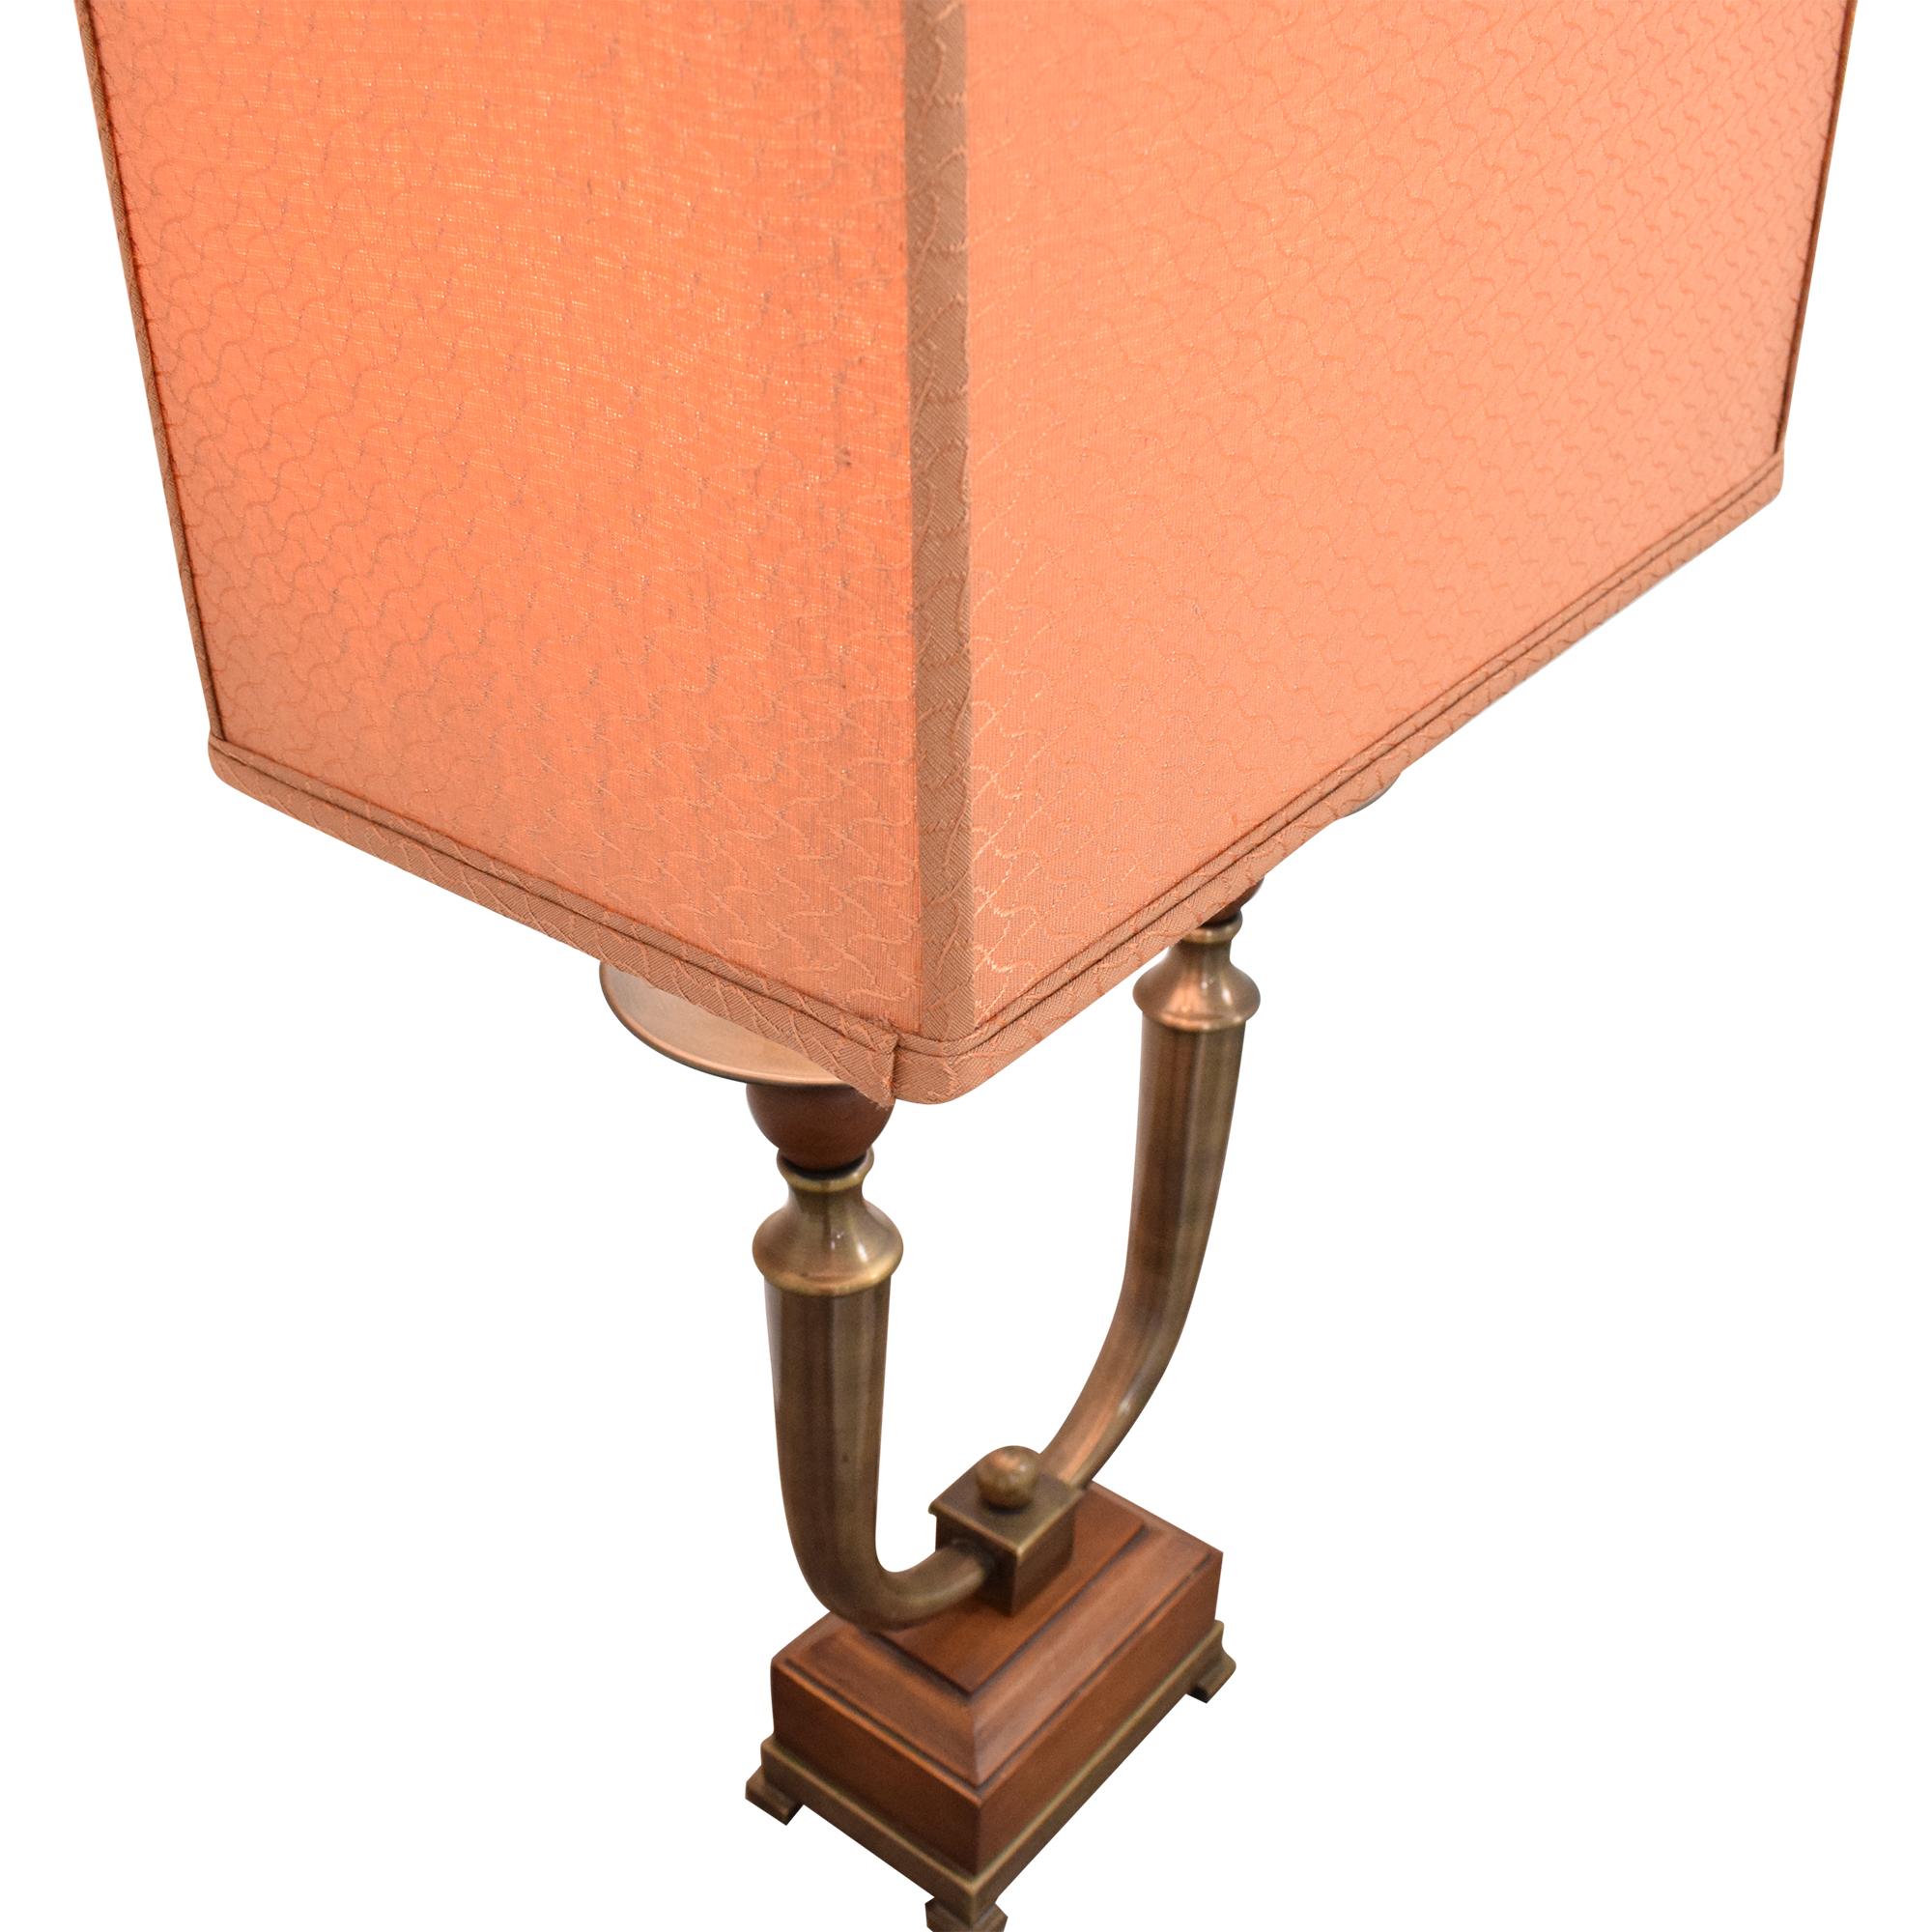 shop Neiman Marcus Table Lamp Neiman Marcus Lamps